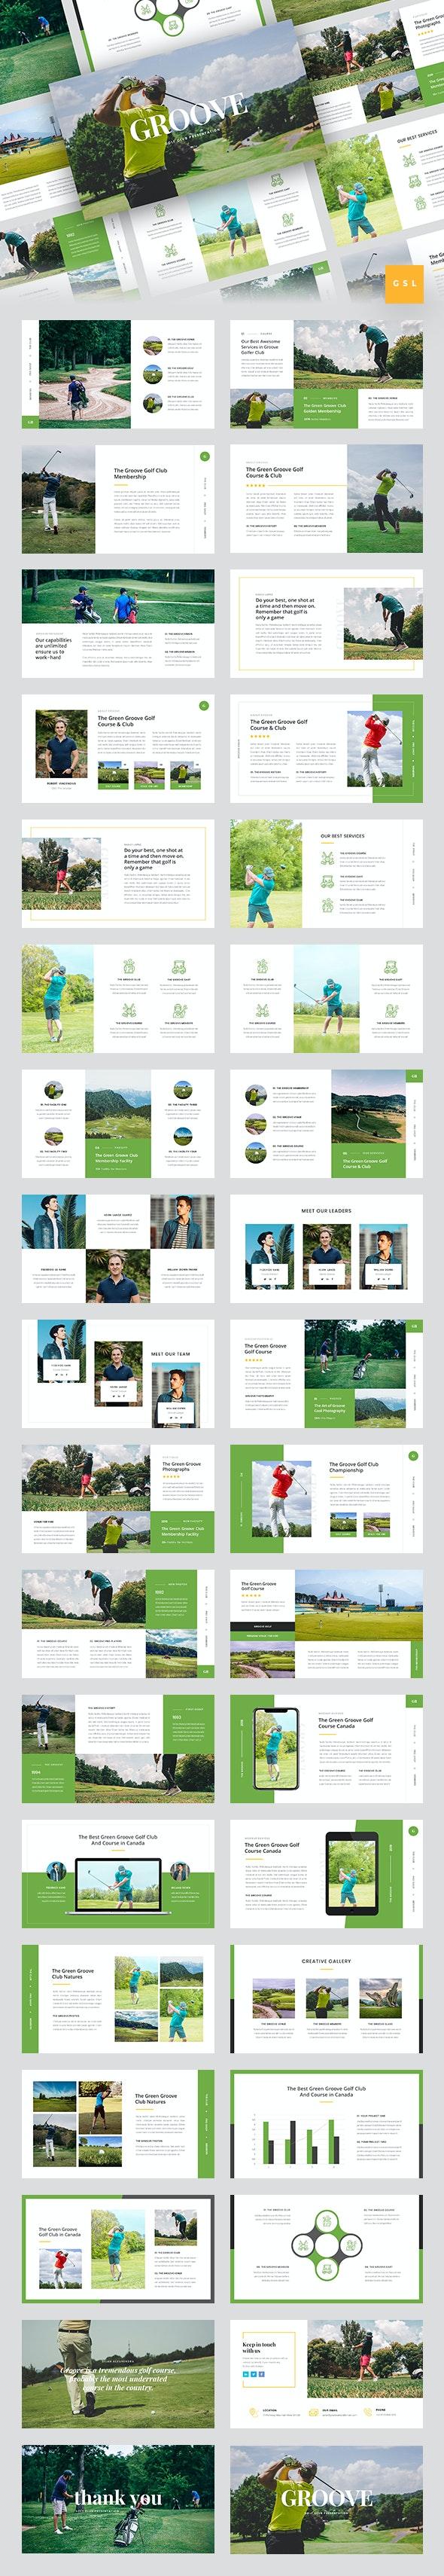 Groove - Golf Club Google Slides Template - Google Slides Presentation Templates